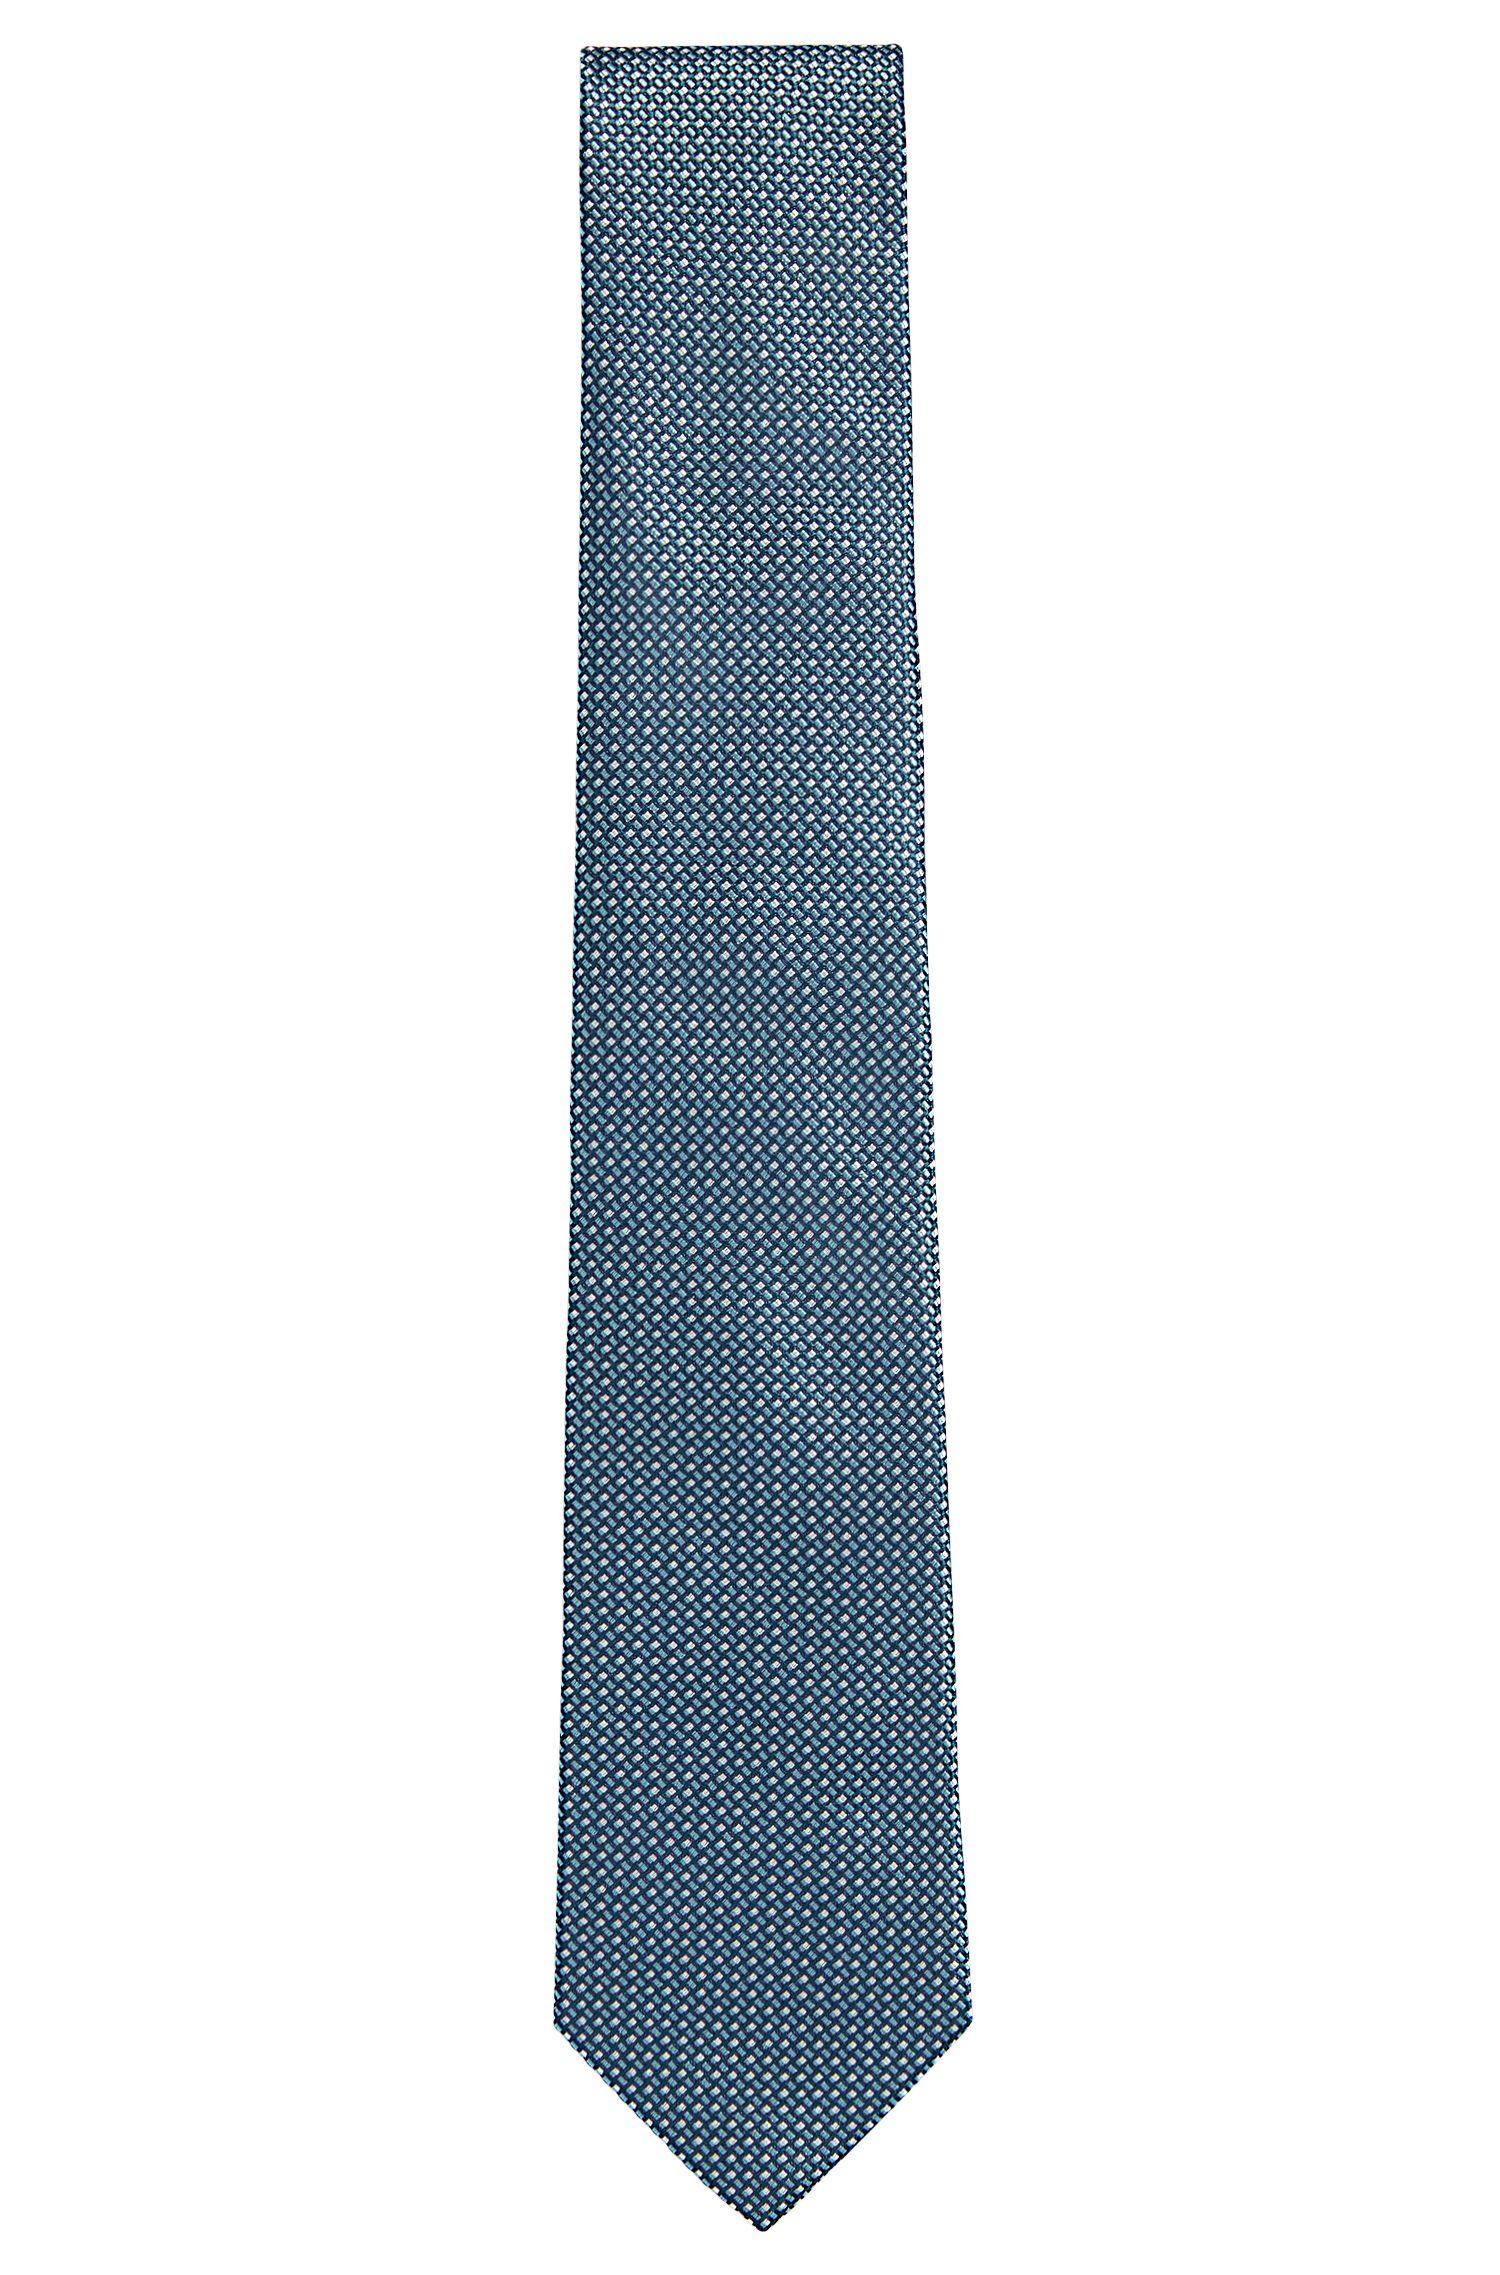 Patterned Silk Tie, Regular | Tie 7.5 cm